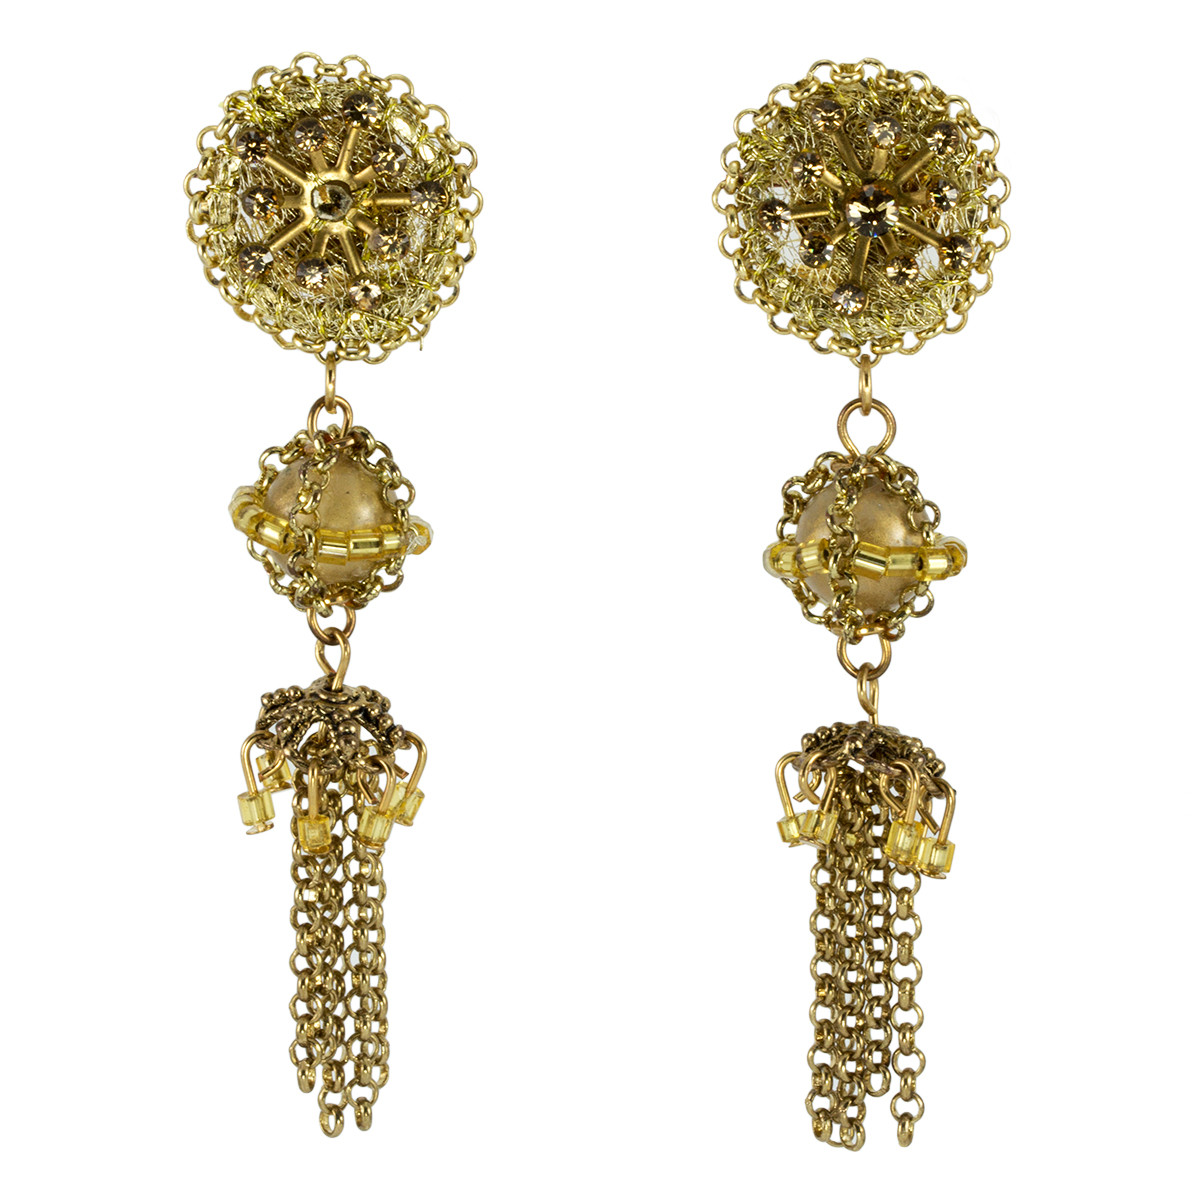 Anat Jewelry Golden River Fashion Net Gold Earrings